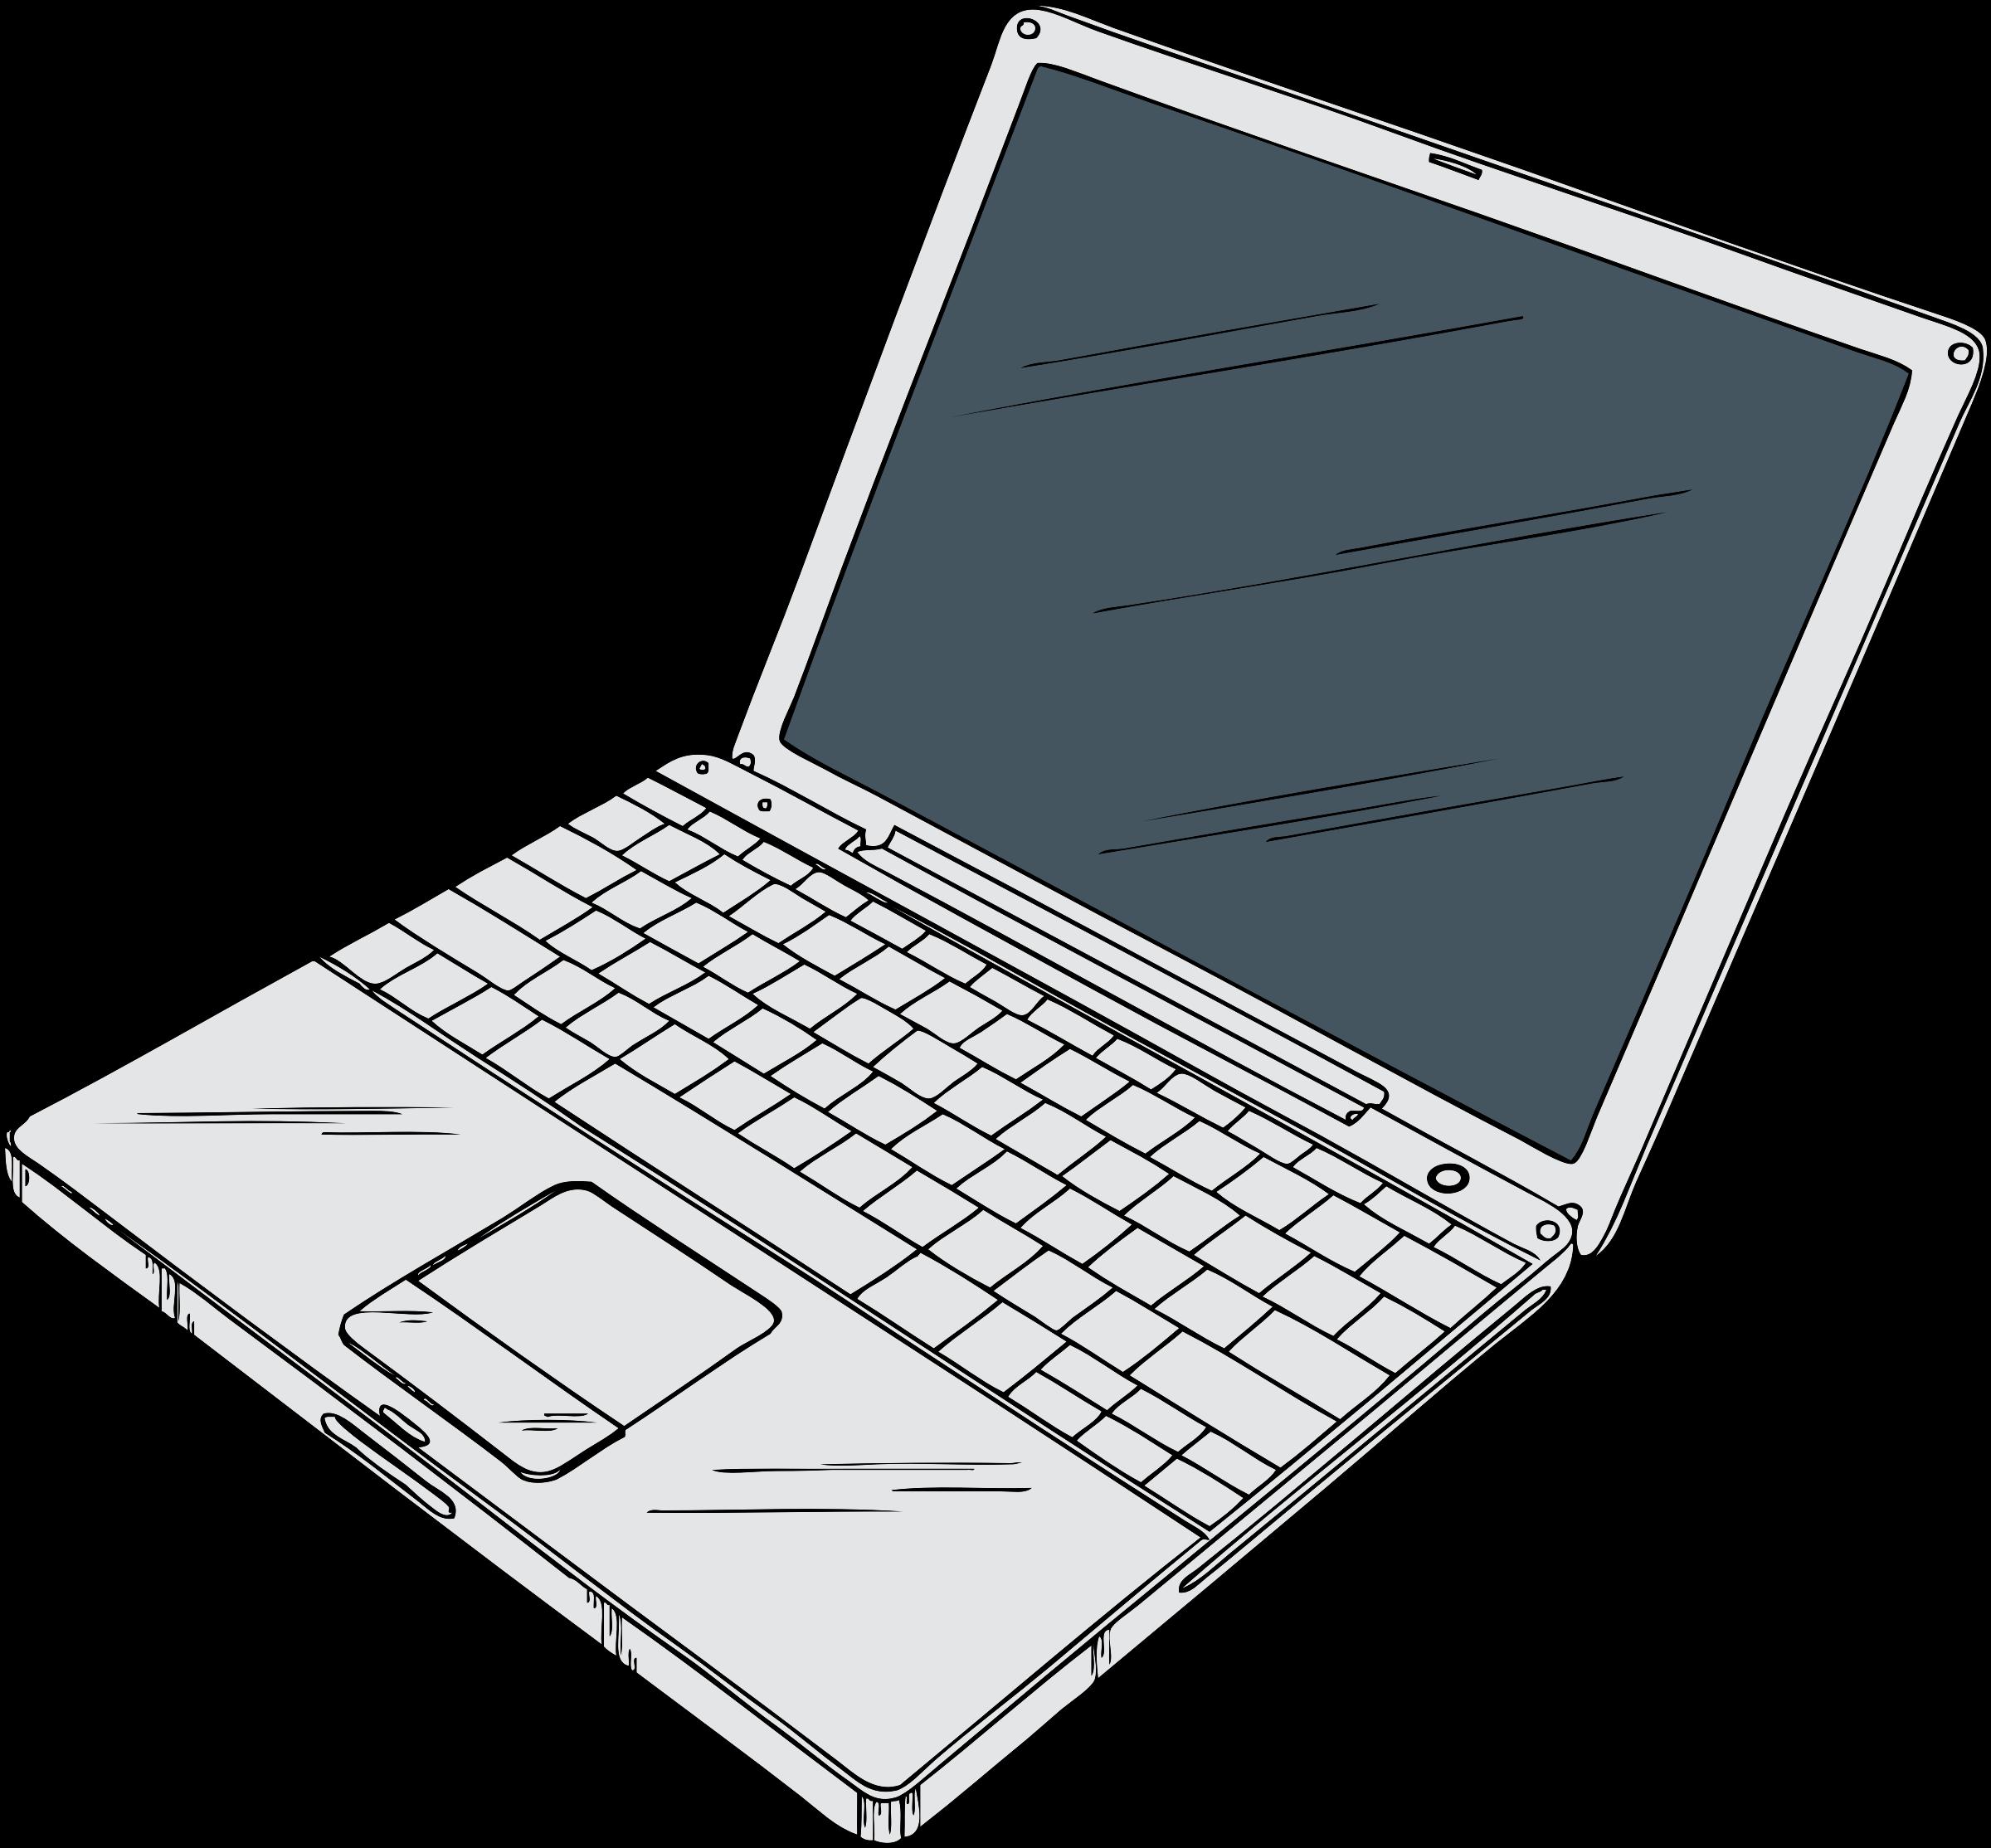 Electronics clipart tech. Powerbook big image png